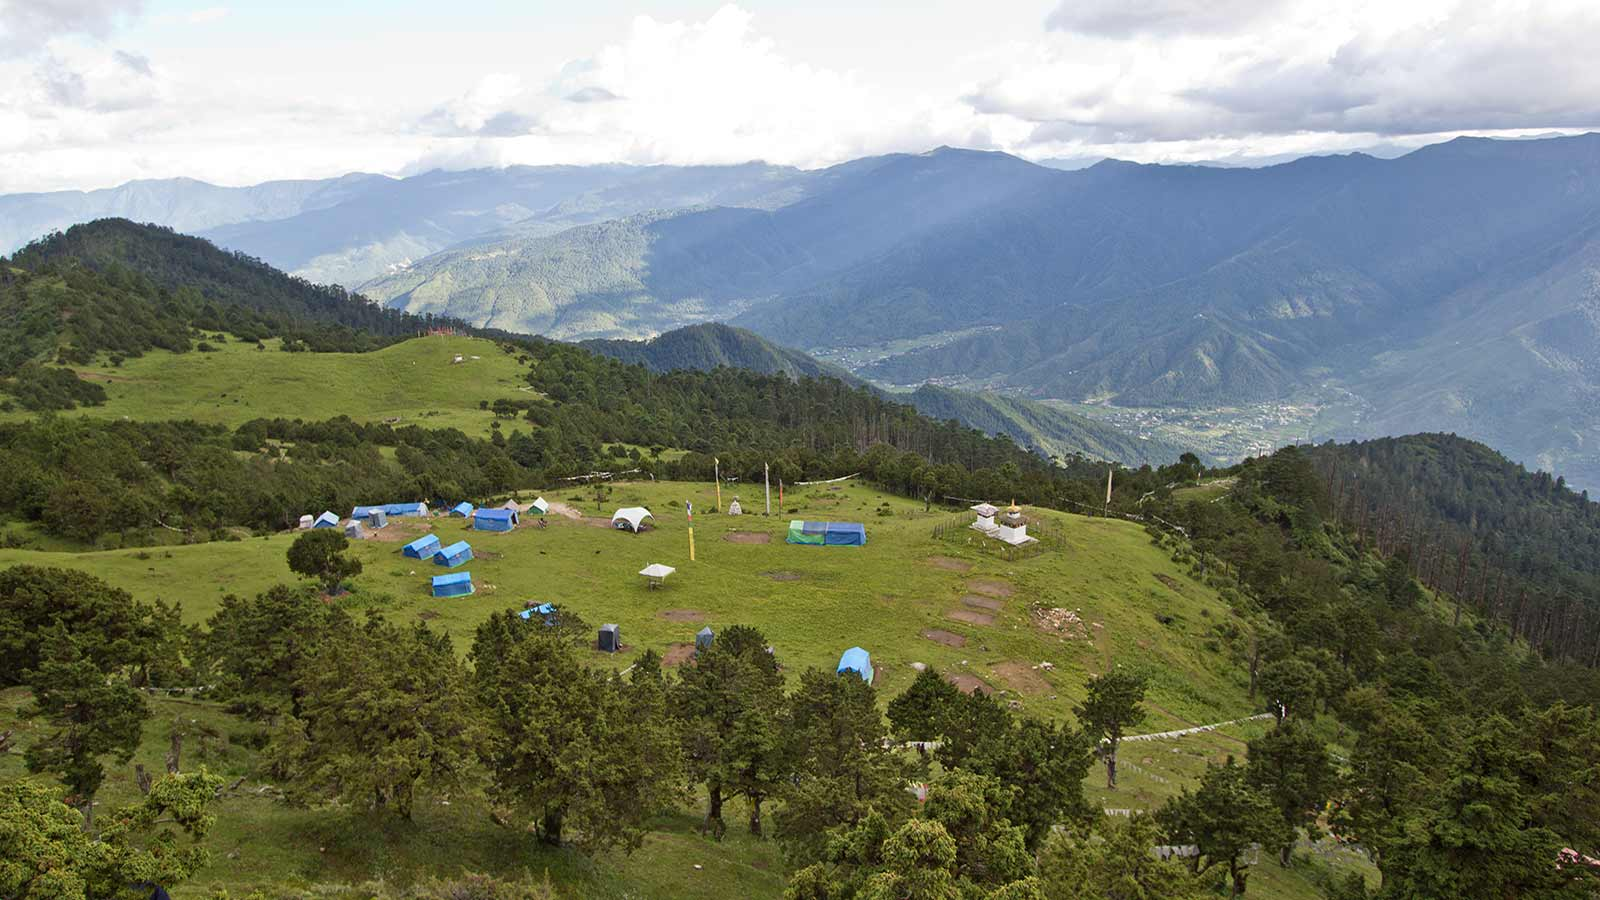 Bumdrak campsite, Bhutan